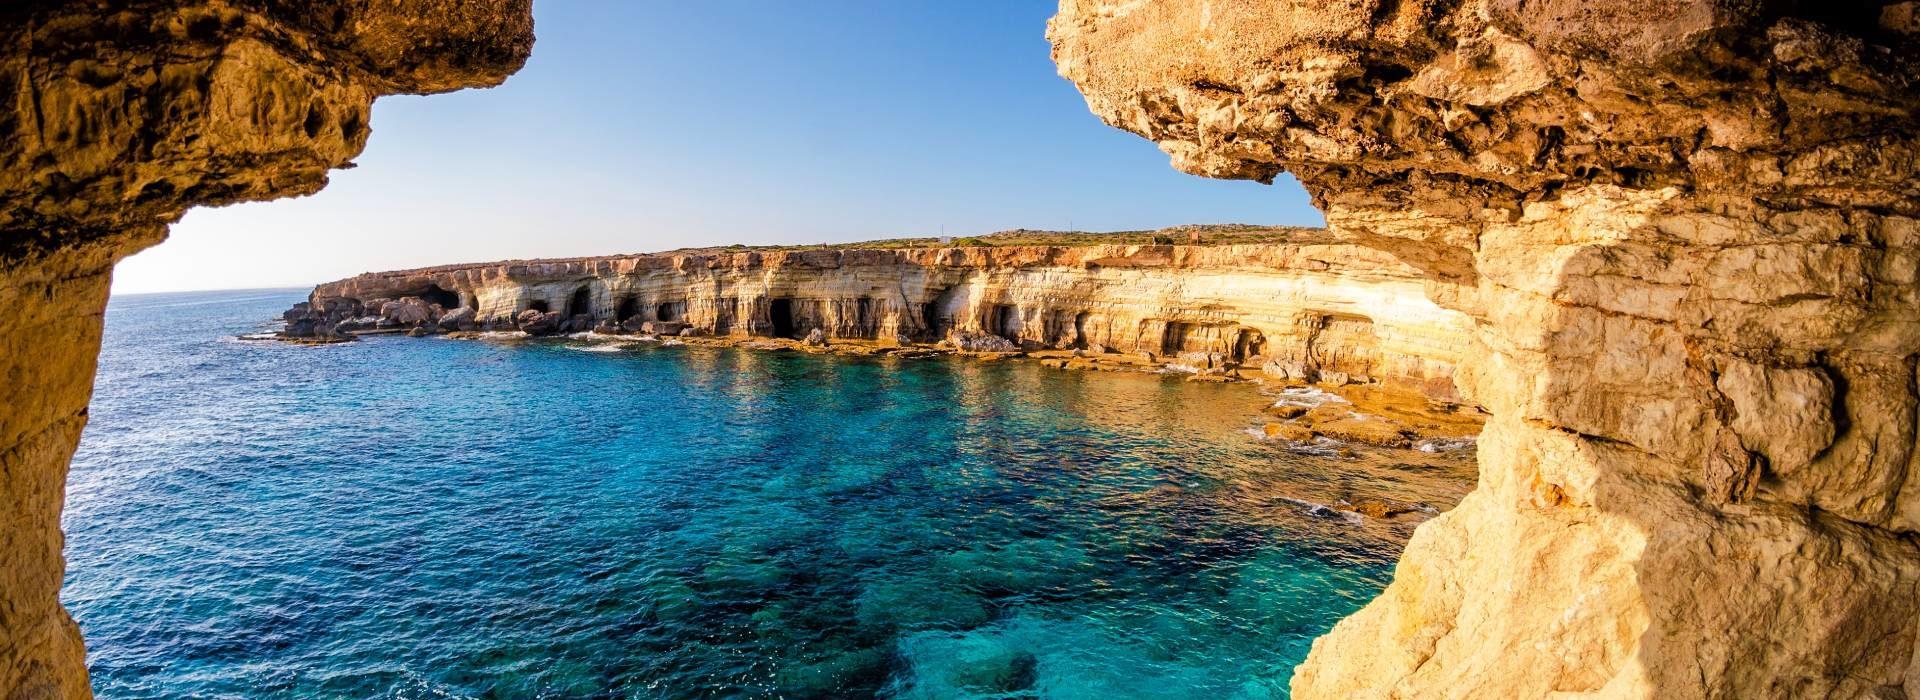 The ocean through rocks in Portugal